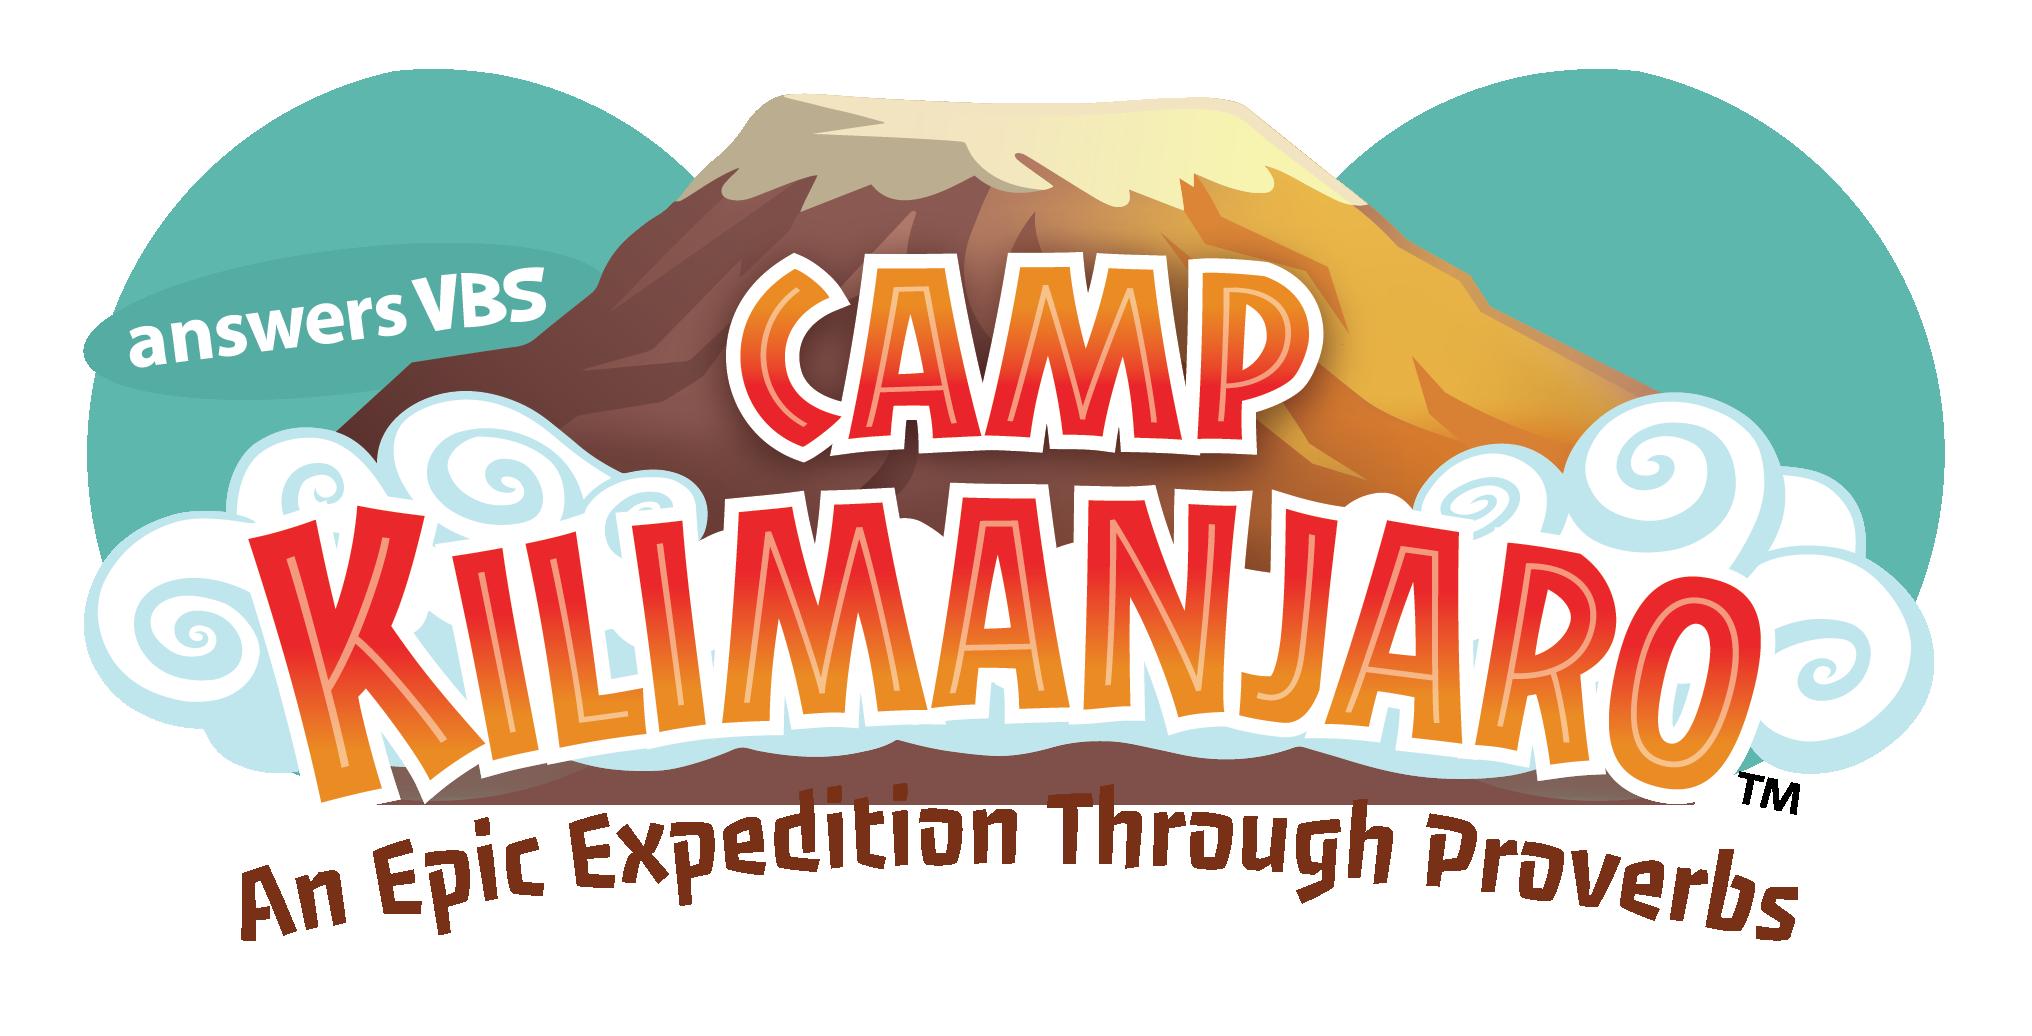 1000+ images about Camp Kilimanjaro Clip Art Images on Pinterest.